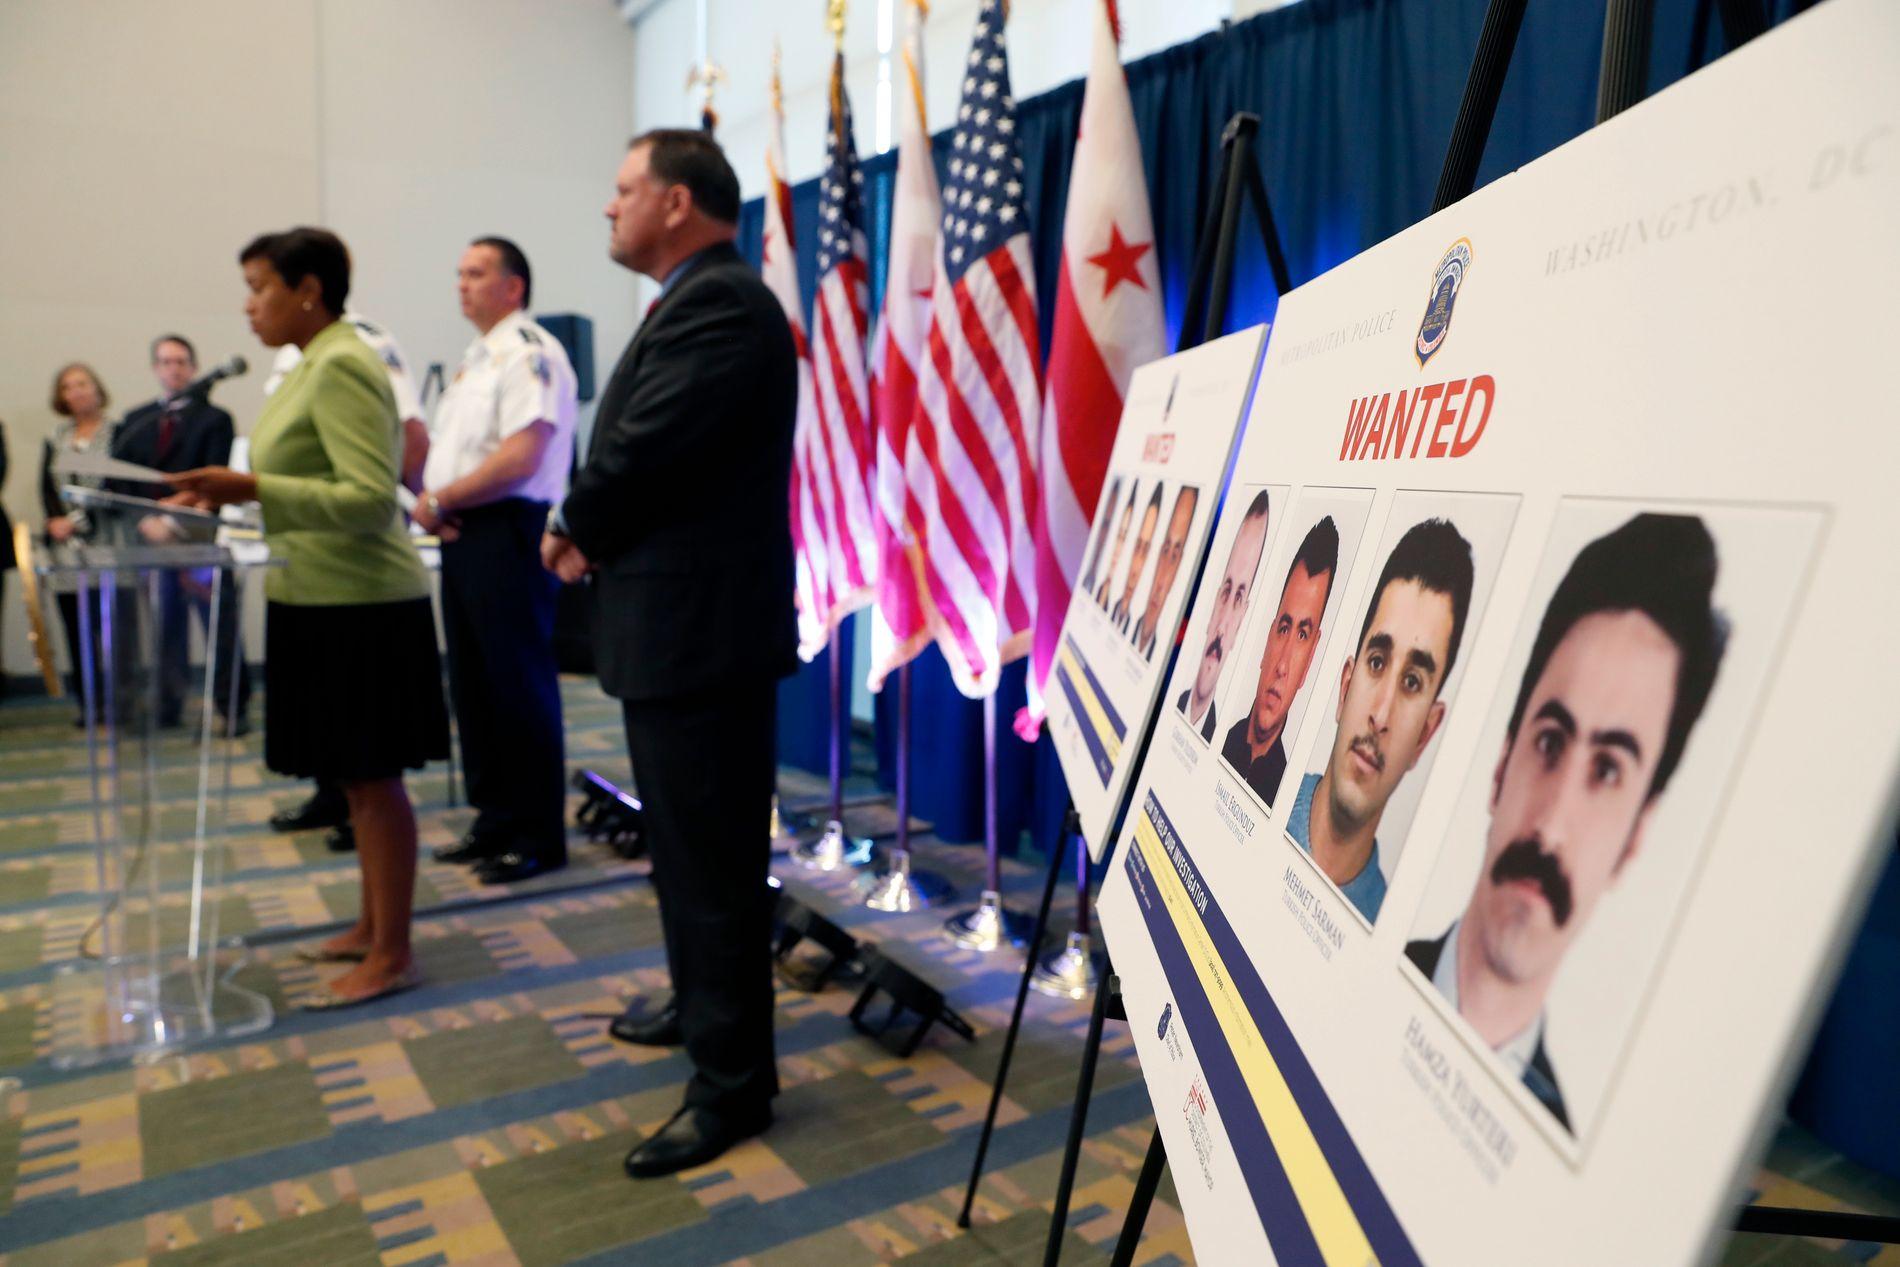 ARRESTORDRE: Borgermesteren i Washington D.C. Muriel Bowser kunngjorde den 15. juni at det er utstedt arrestordre på tolv personer fra den tyrkiske presidentens livvakttjeneste.